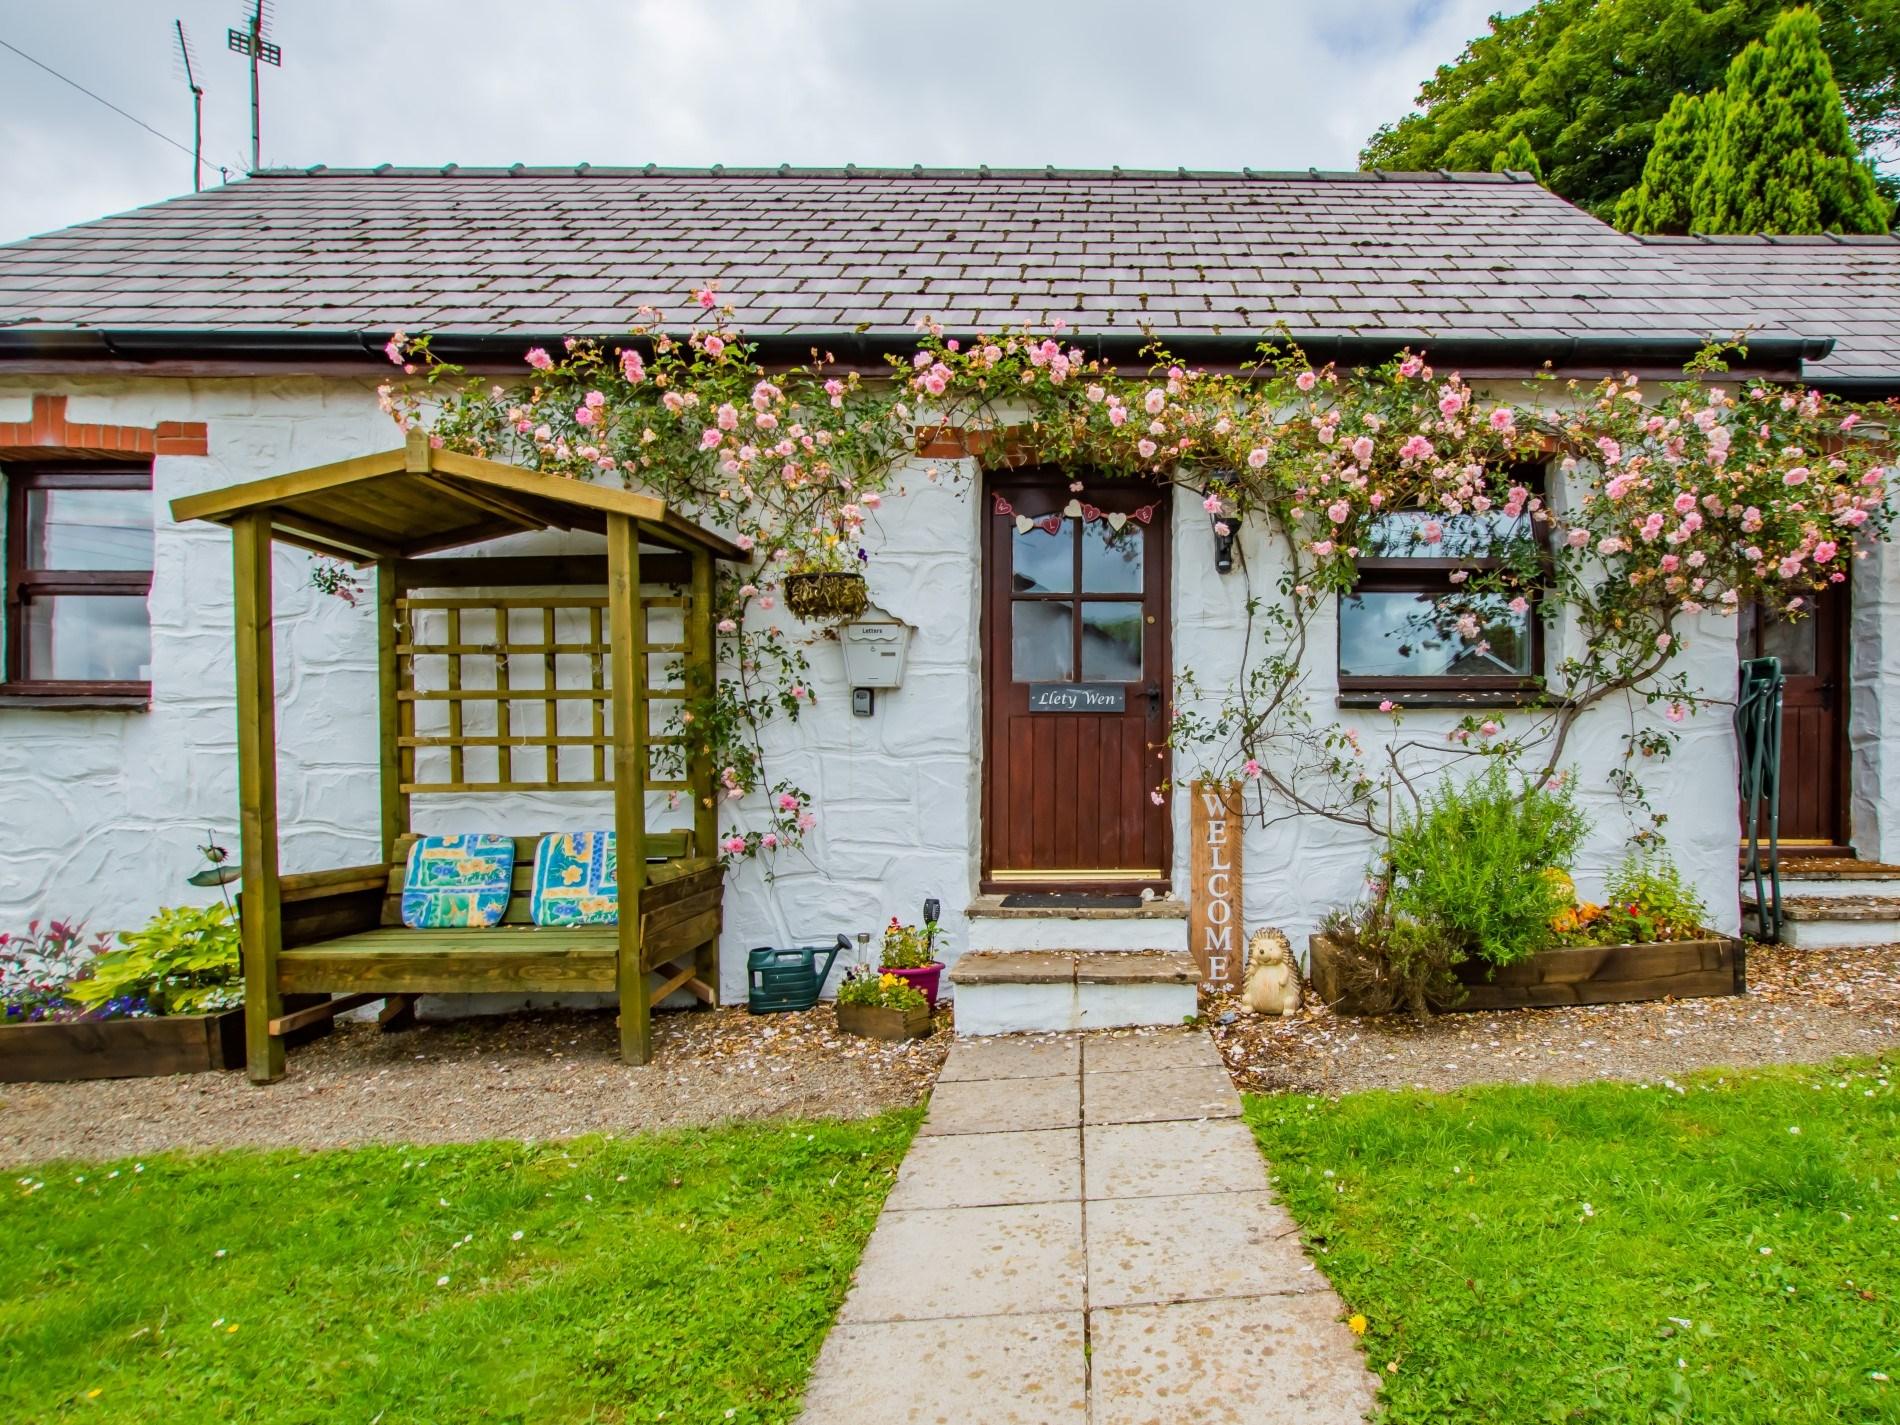 1 Bedroom Cottage in Clarbeston Road, Mid Wales